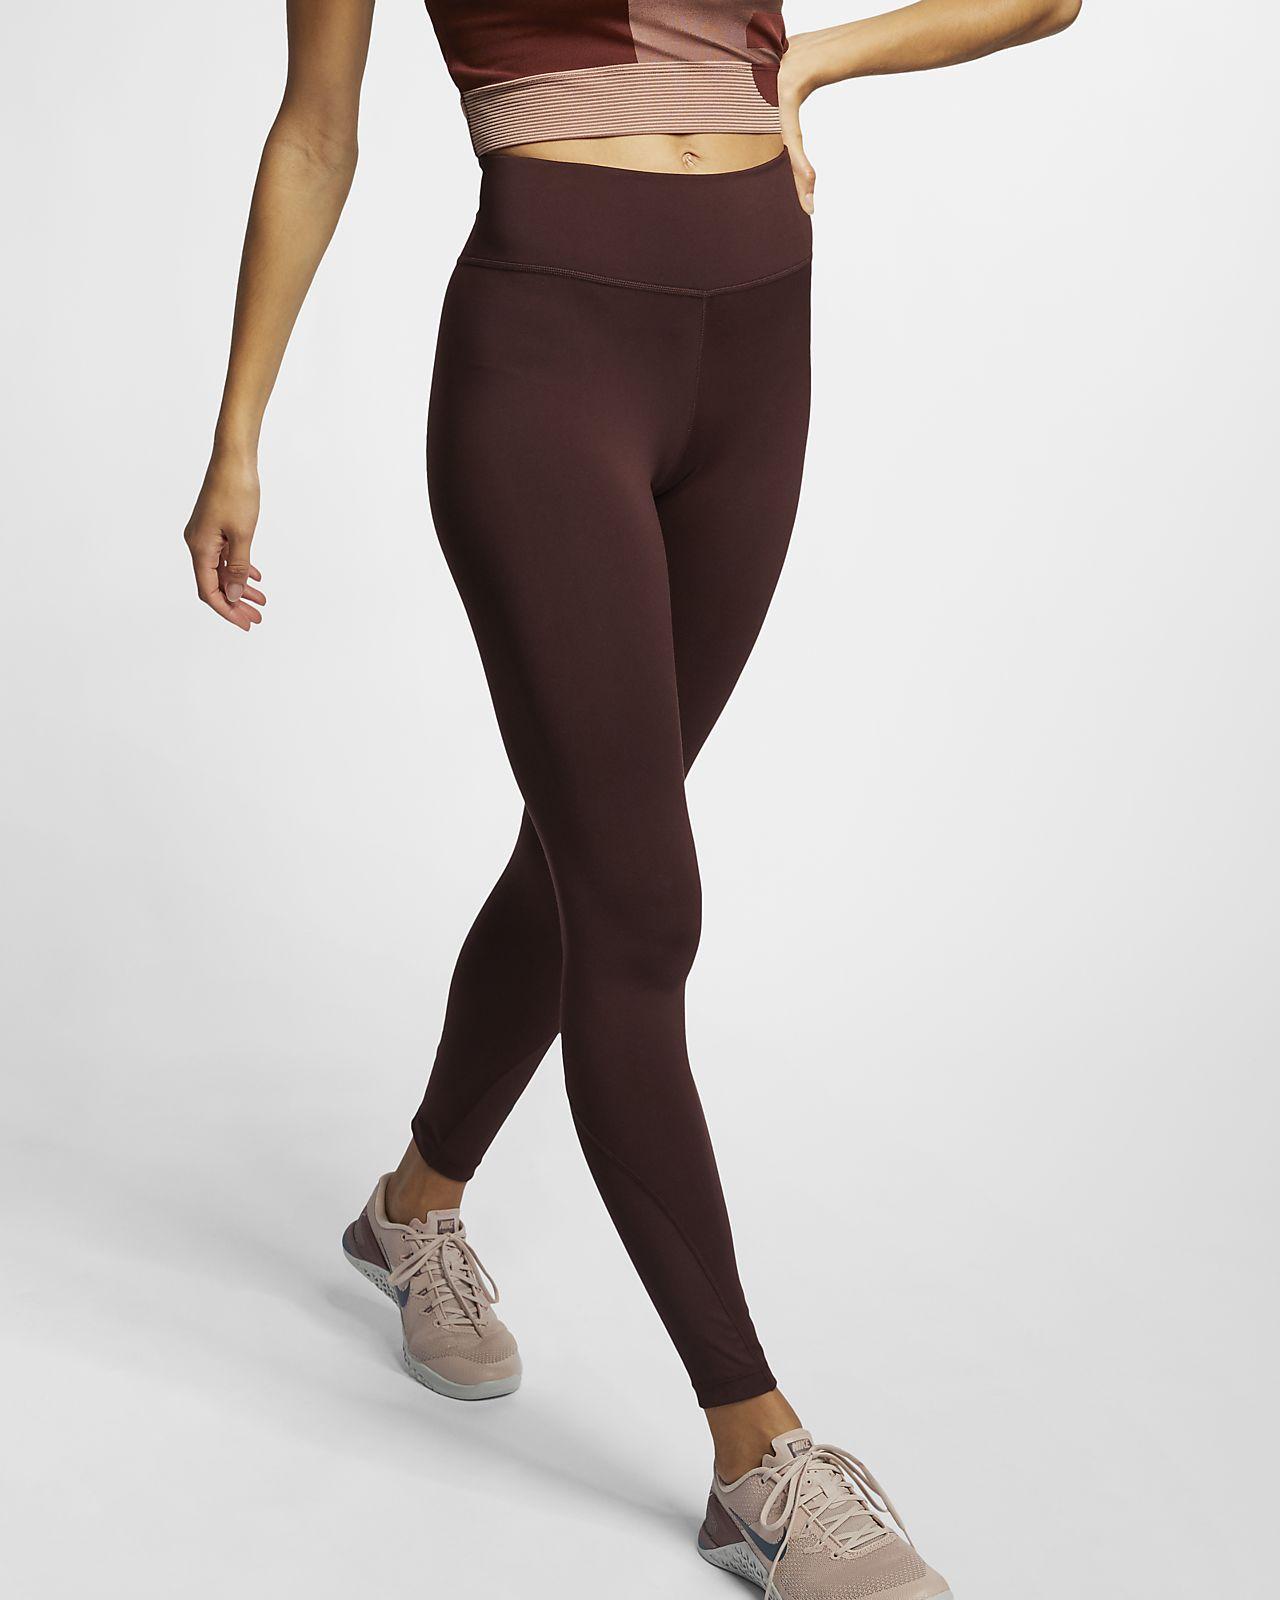 Nike One Women's 7/8 Training Tights